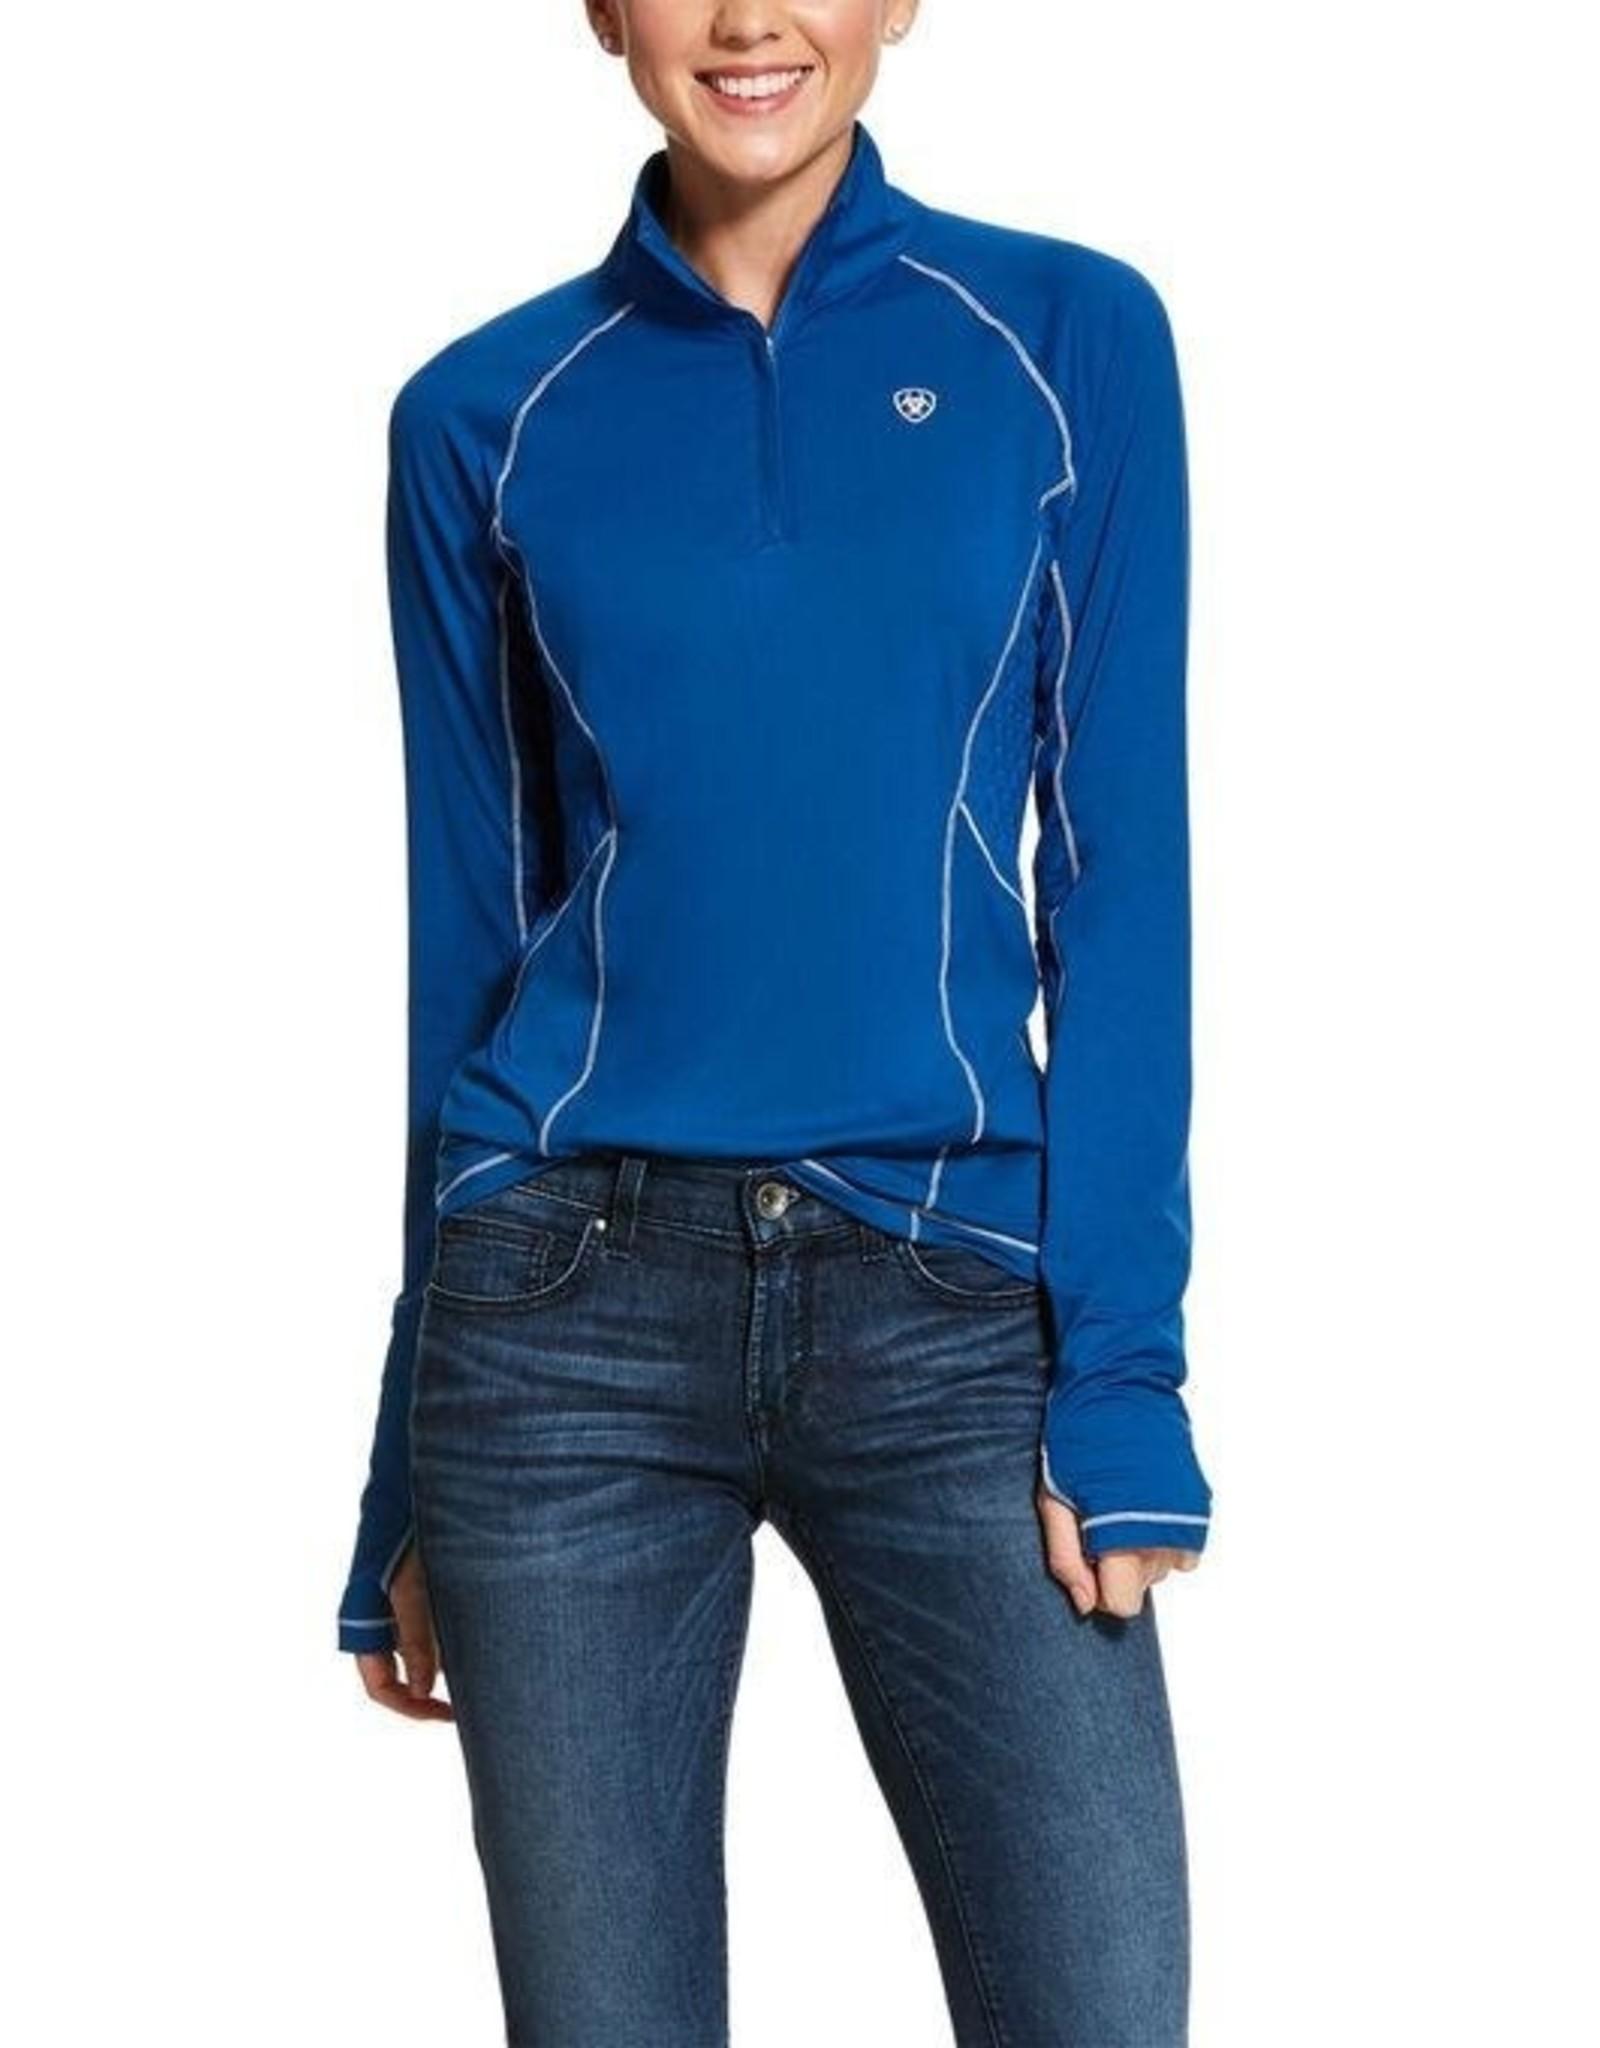 Ariat Ladies' Lowell 2.0 Baselayer Shirt